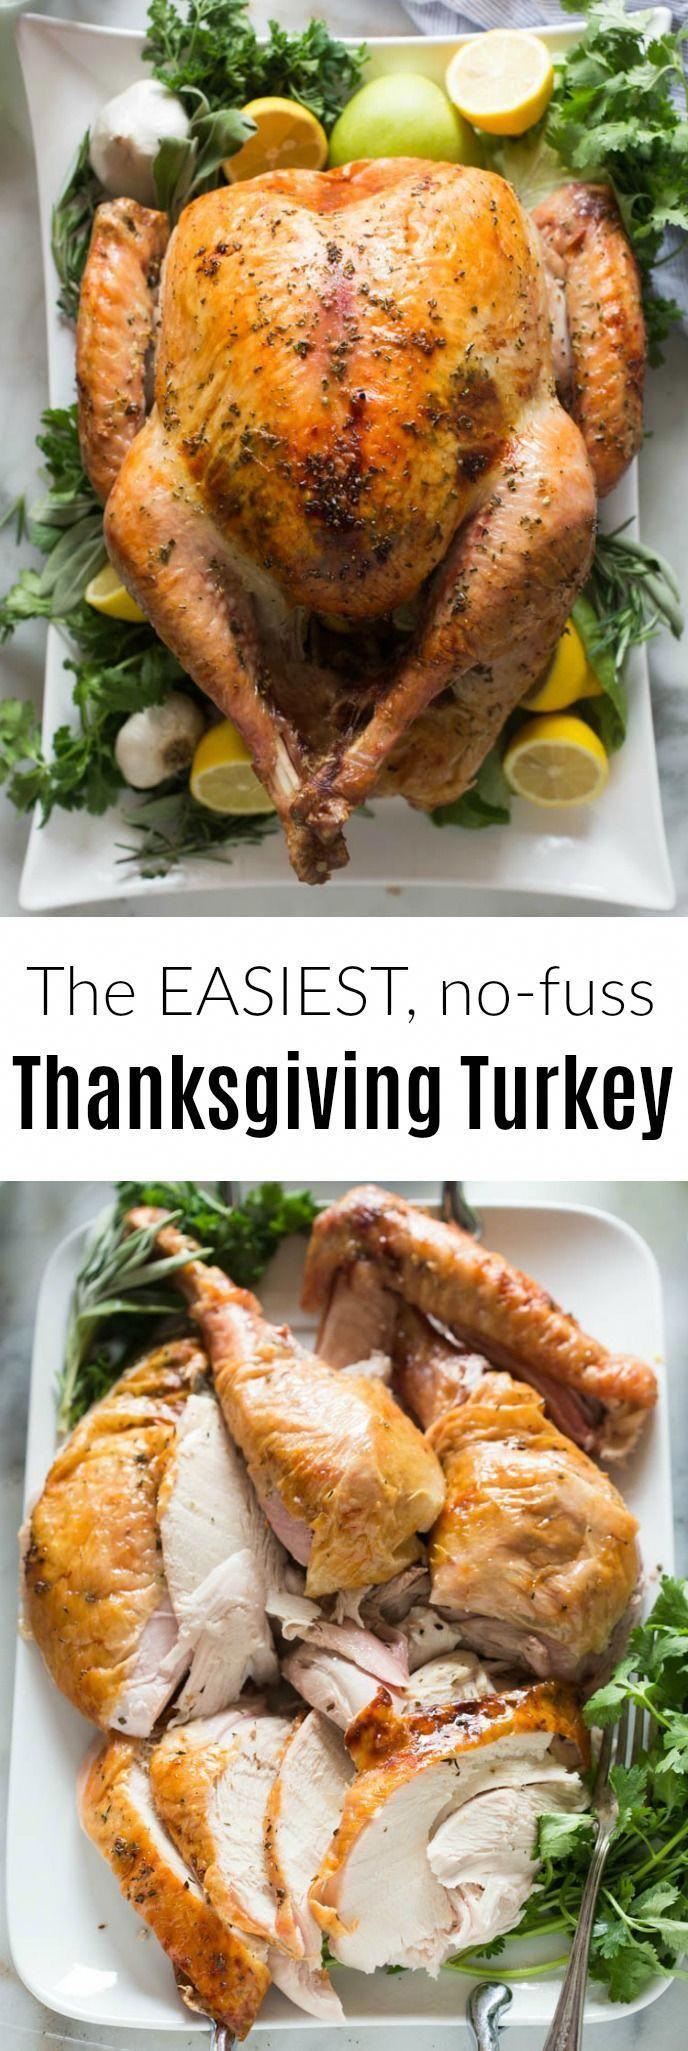 Easy, No-Fuss Thanksgiving Turkey -   19 thanksgiving recipes turkey easy ideas